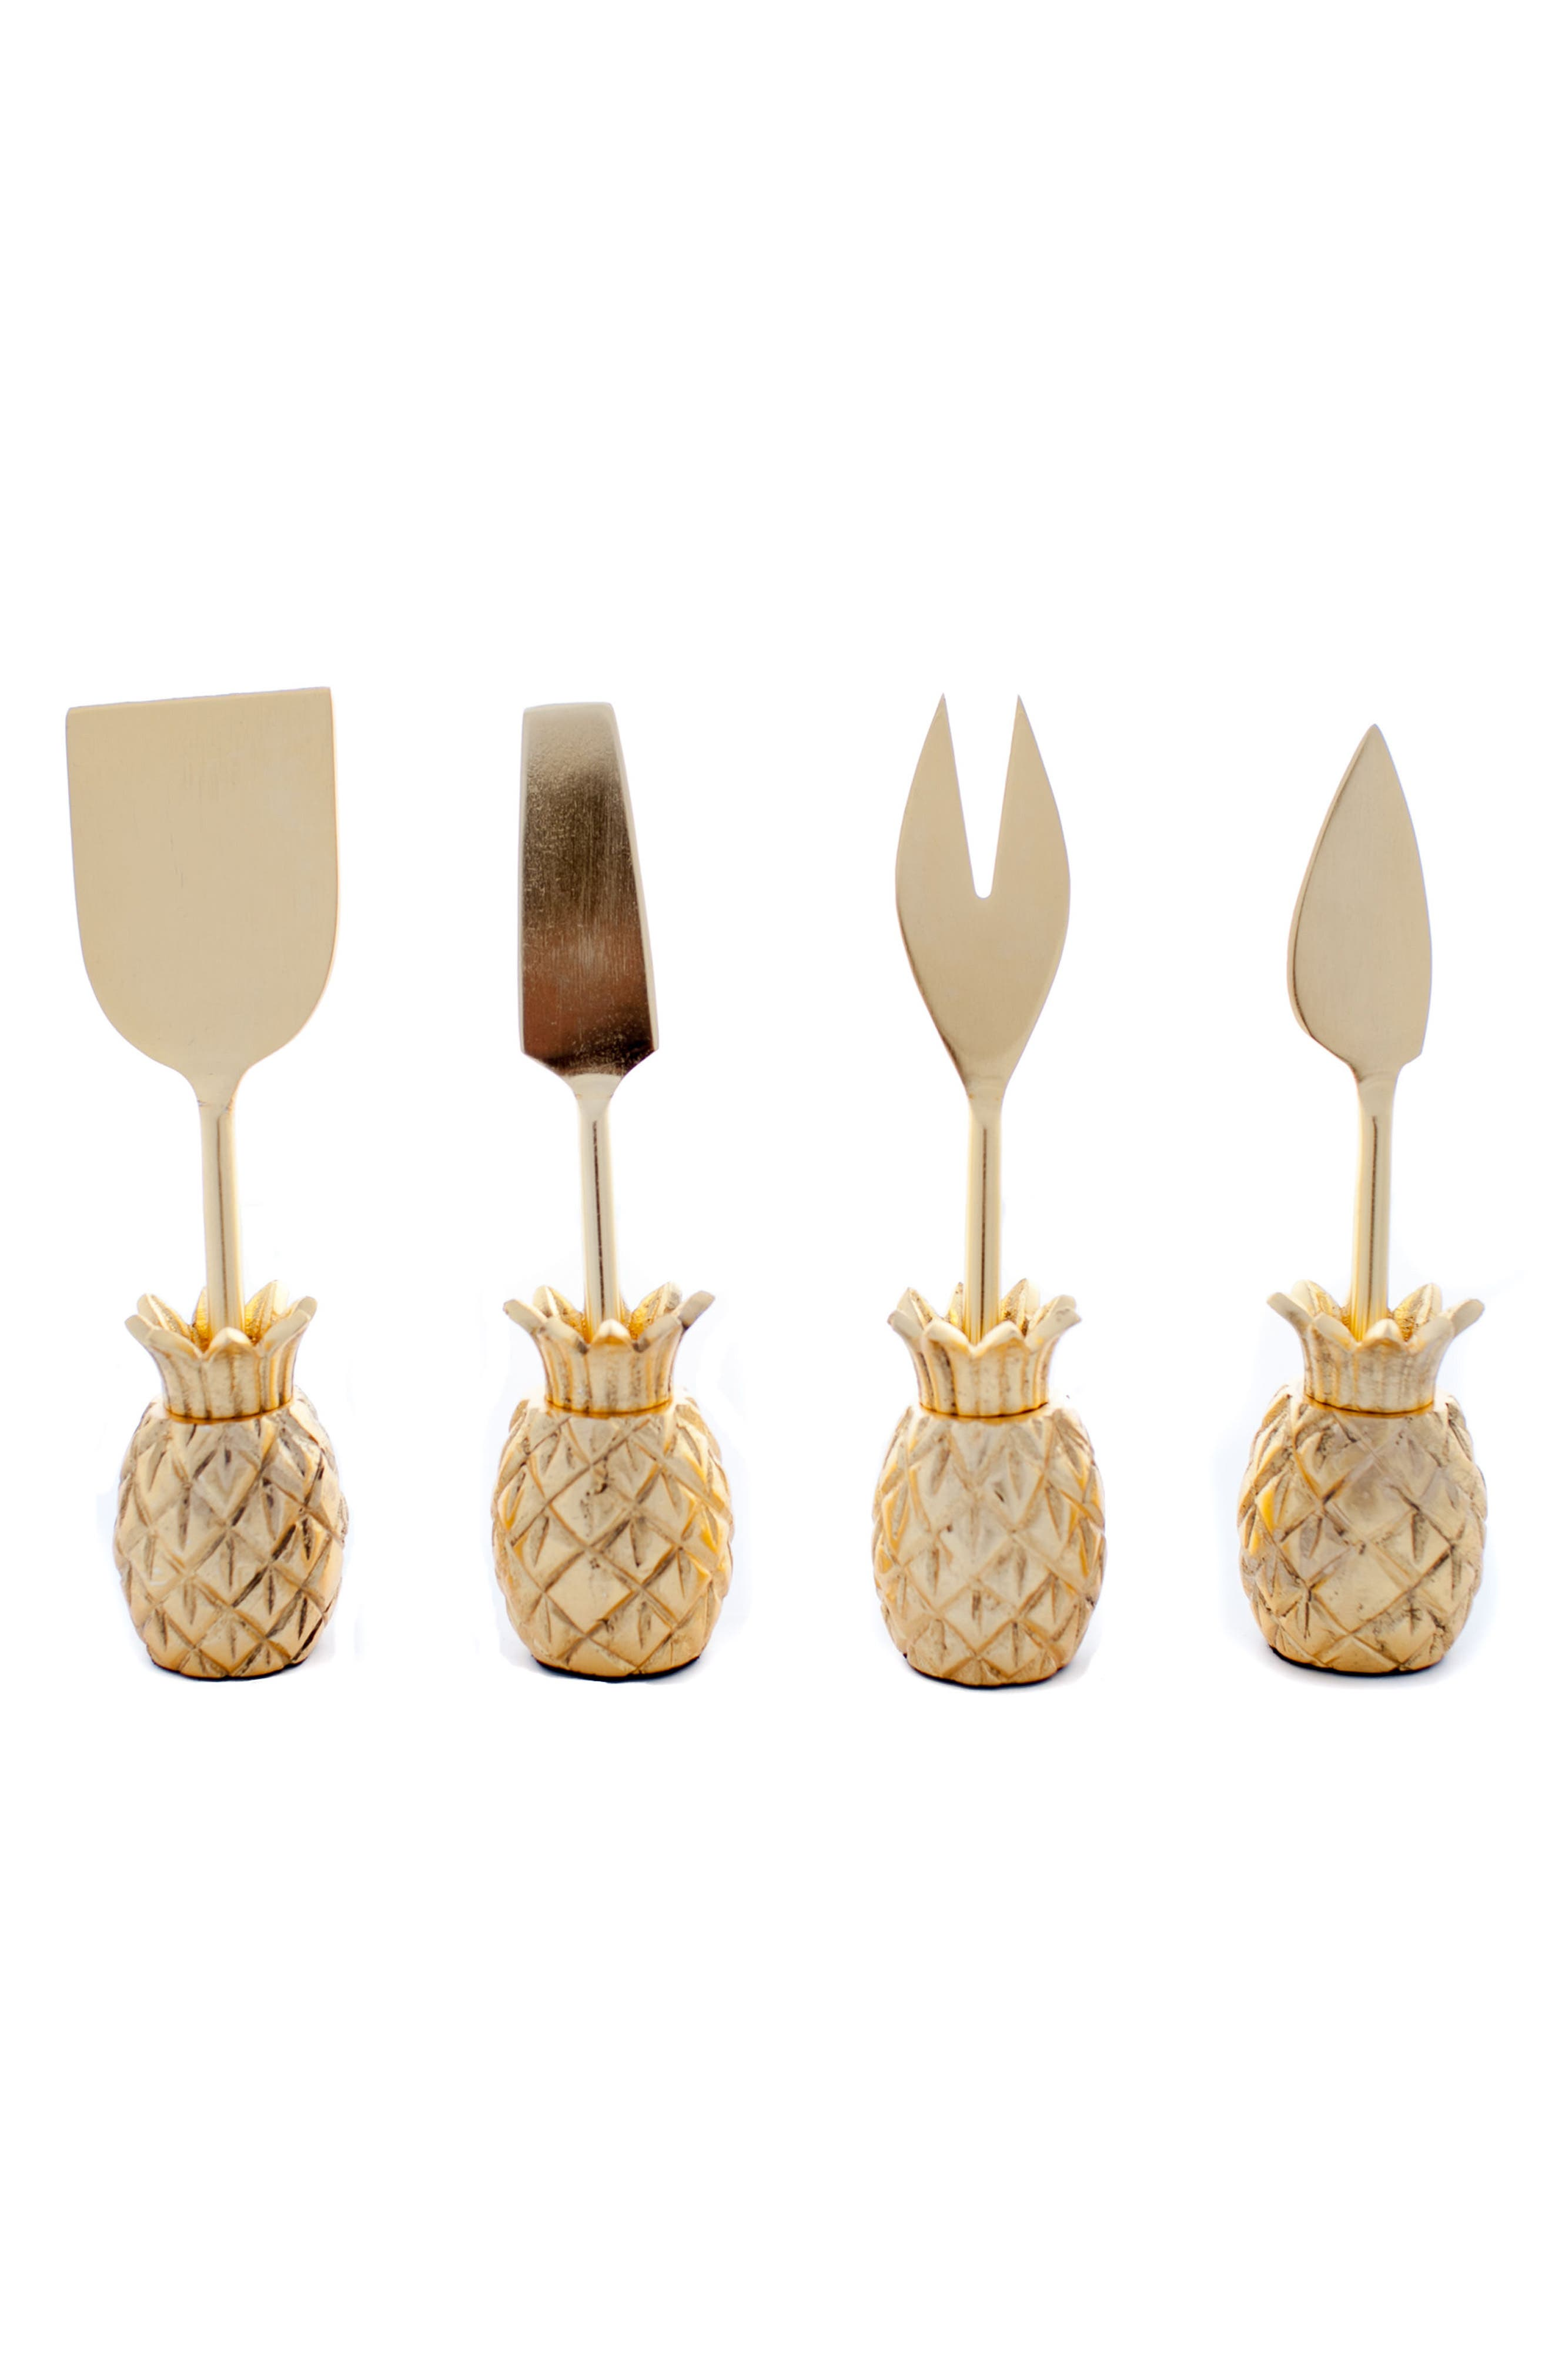 Luau Set of 4 Cheese Knives,                             Main thumbnail 1, color,                             Gold